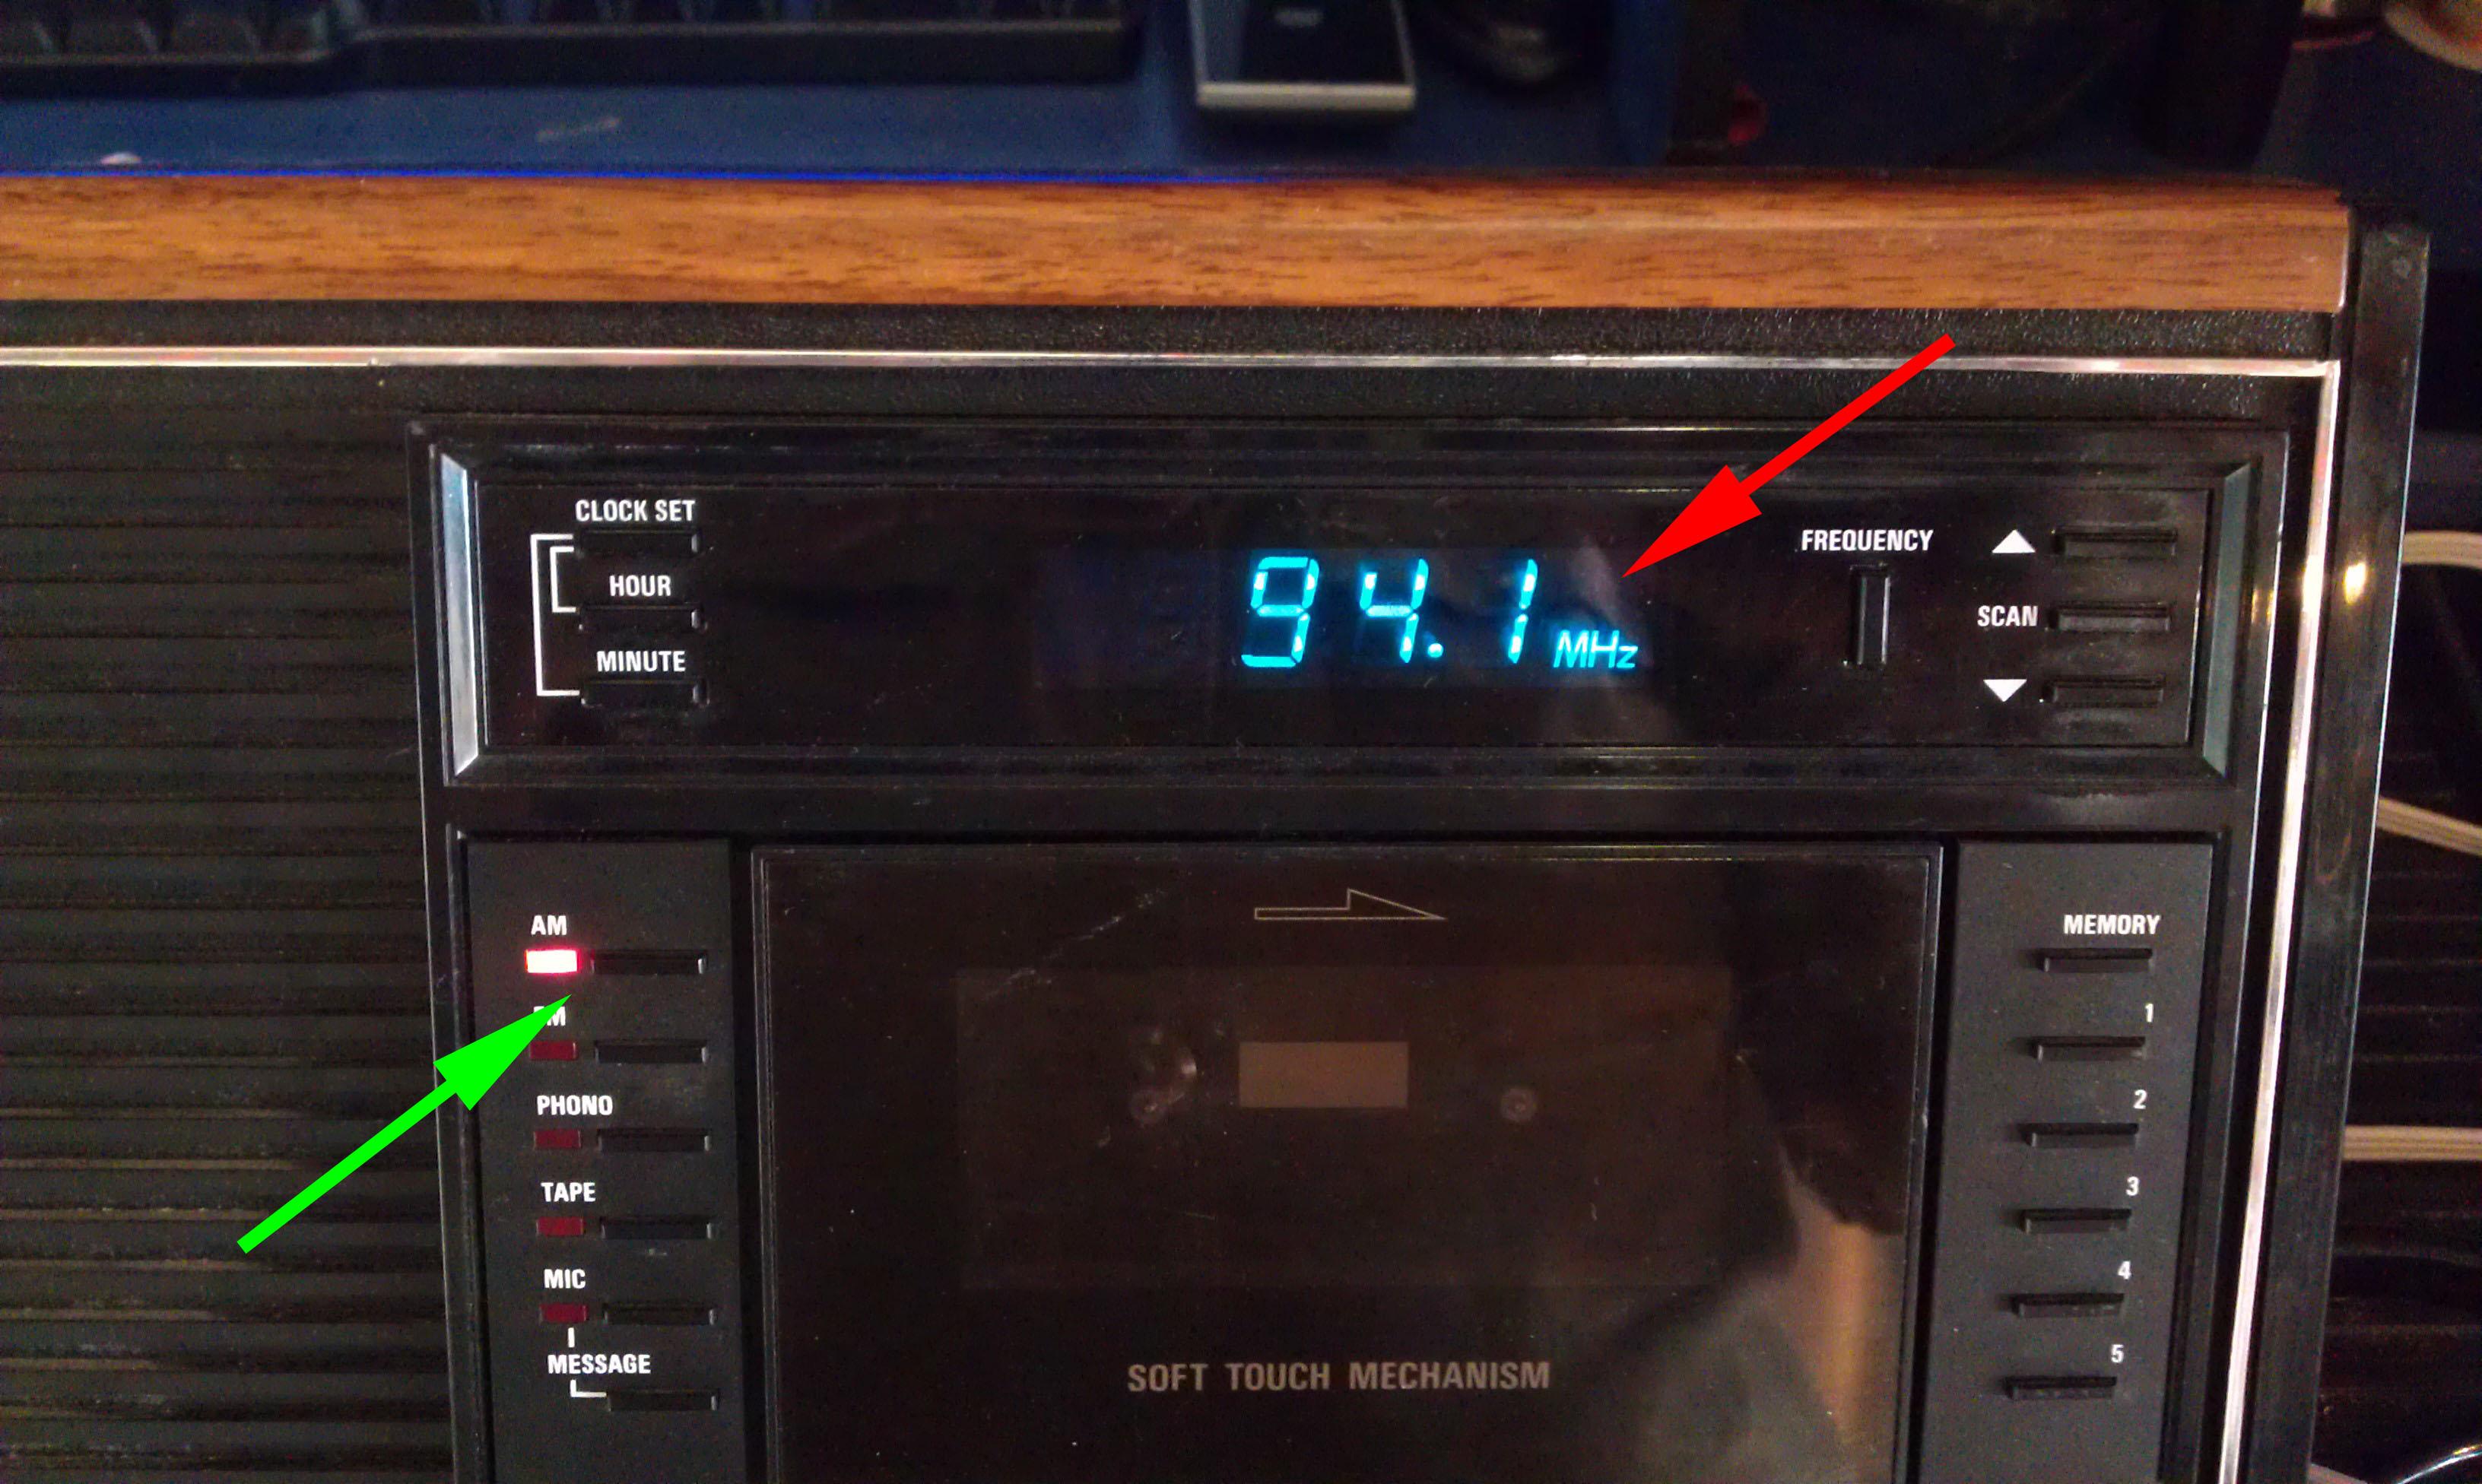 IM4006 AM Frequency Diplay Incorrect?__SQUARESPACE_CACHEVERSION=1389915064481 your site name im4006 nutone model im4006 radio cassette intercom nutone im 4006 wiring diagram at eliteediting.co